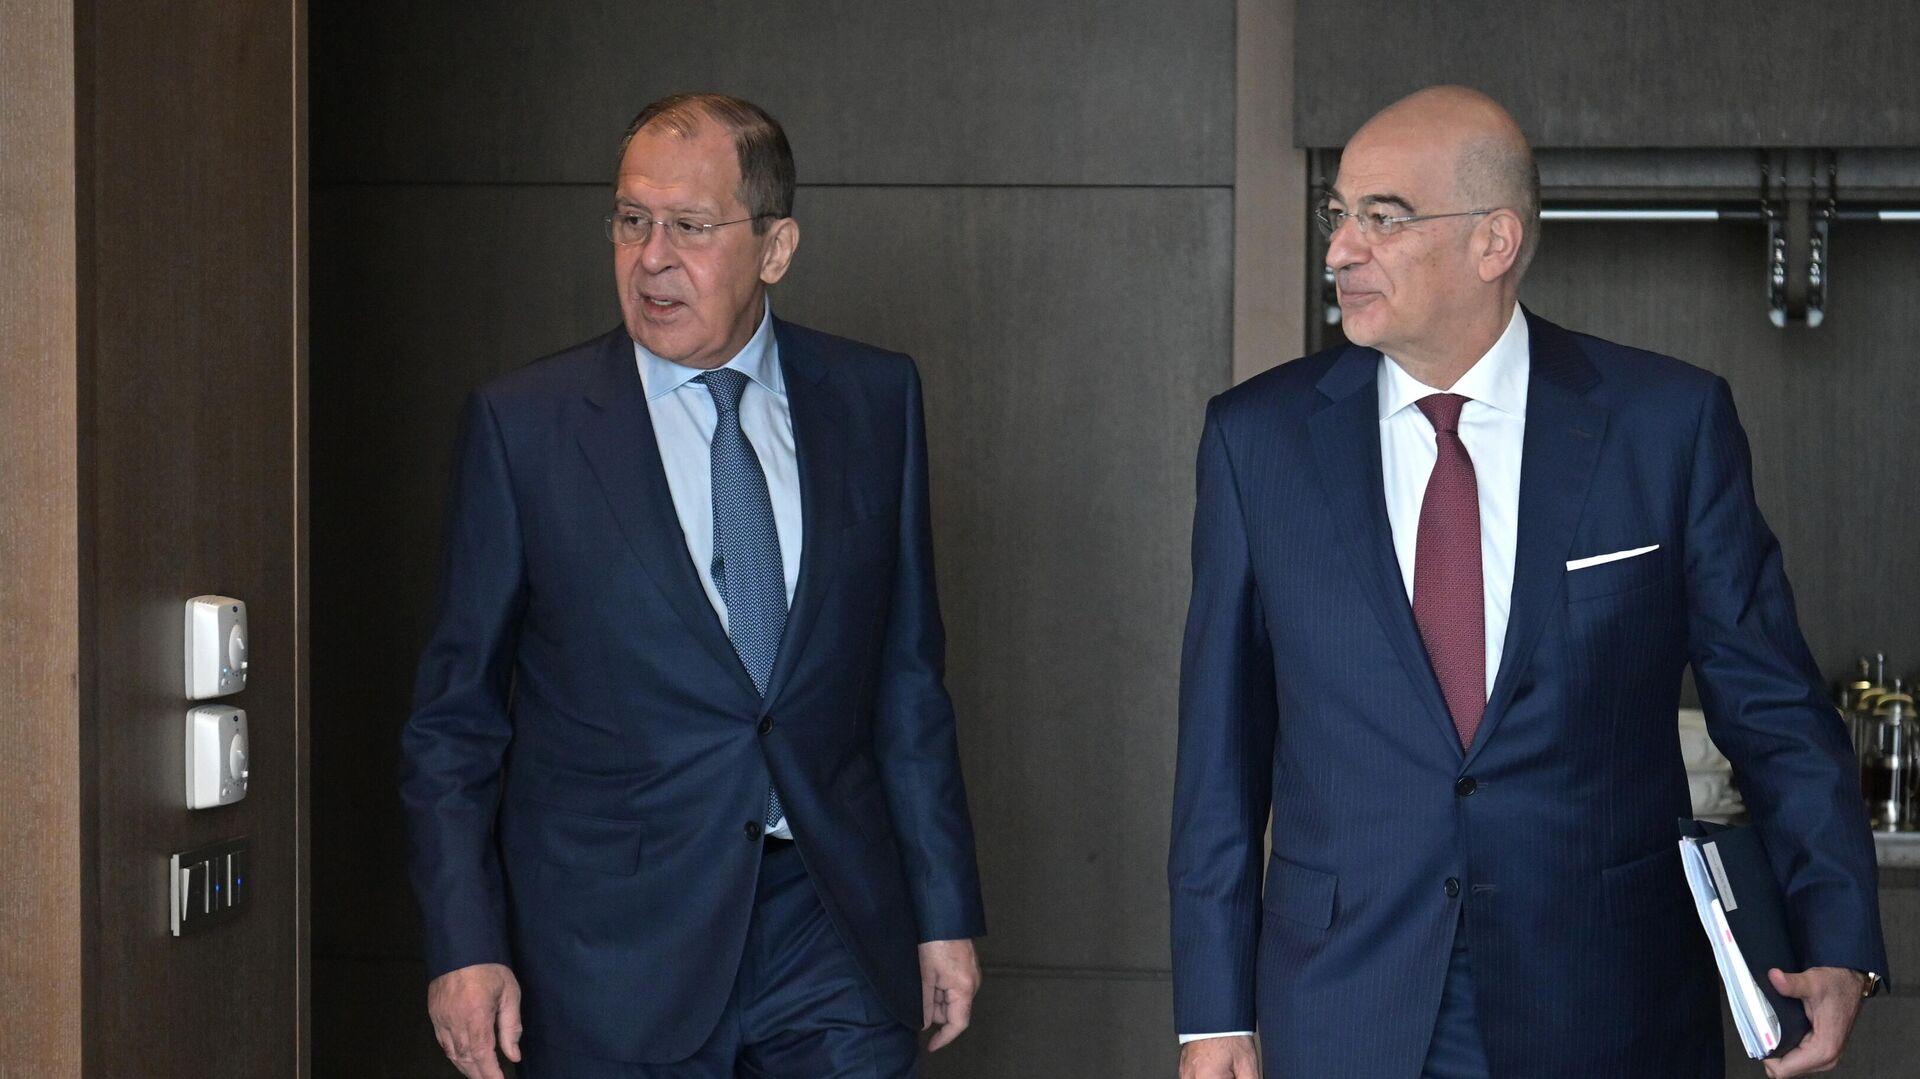 Россия настроена на диалог с ЕС на равноправной основе, заявил Лавров